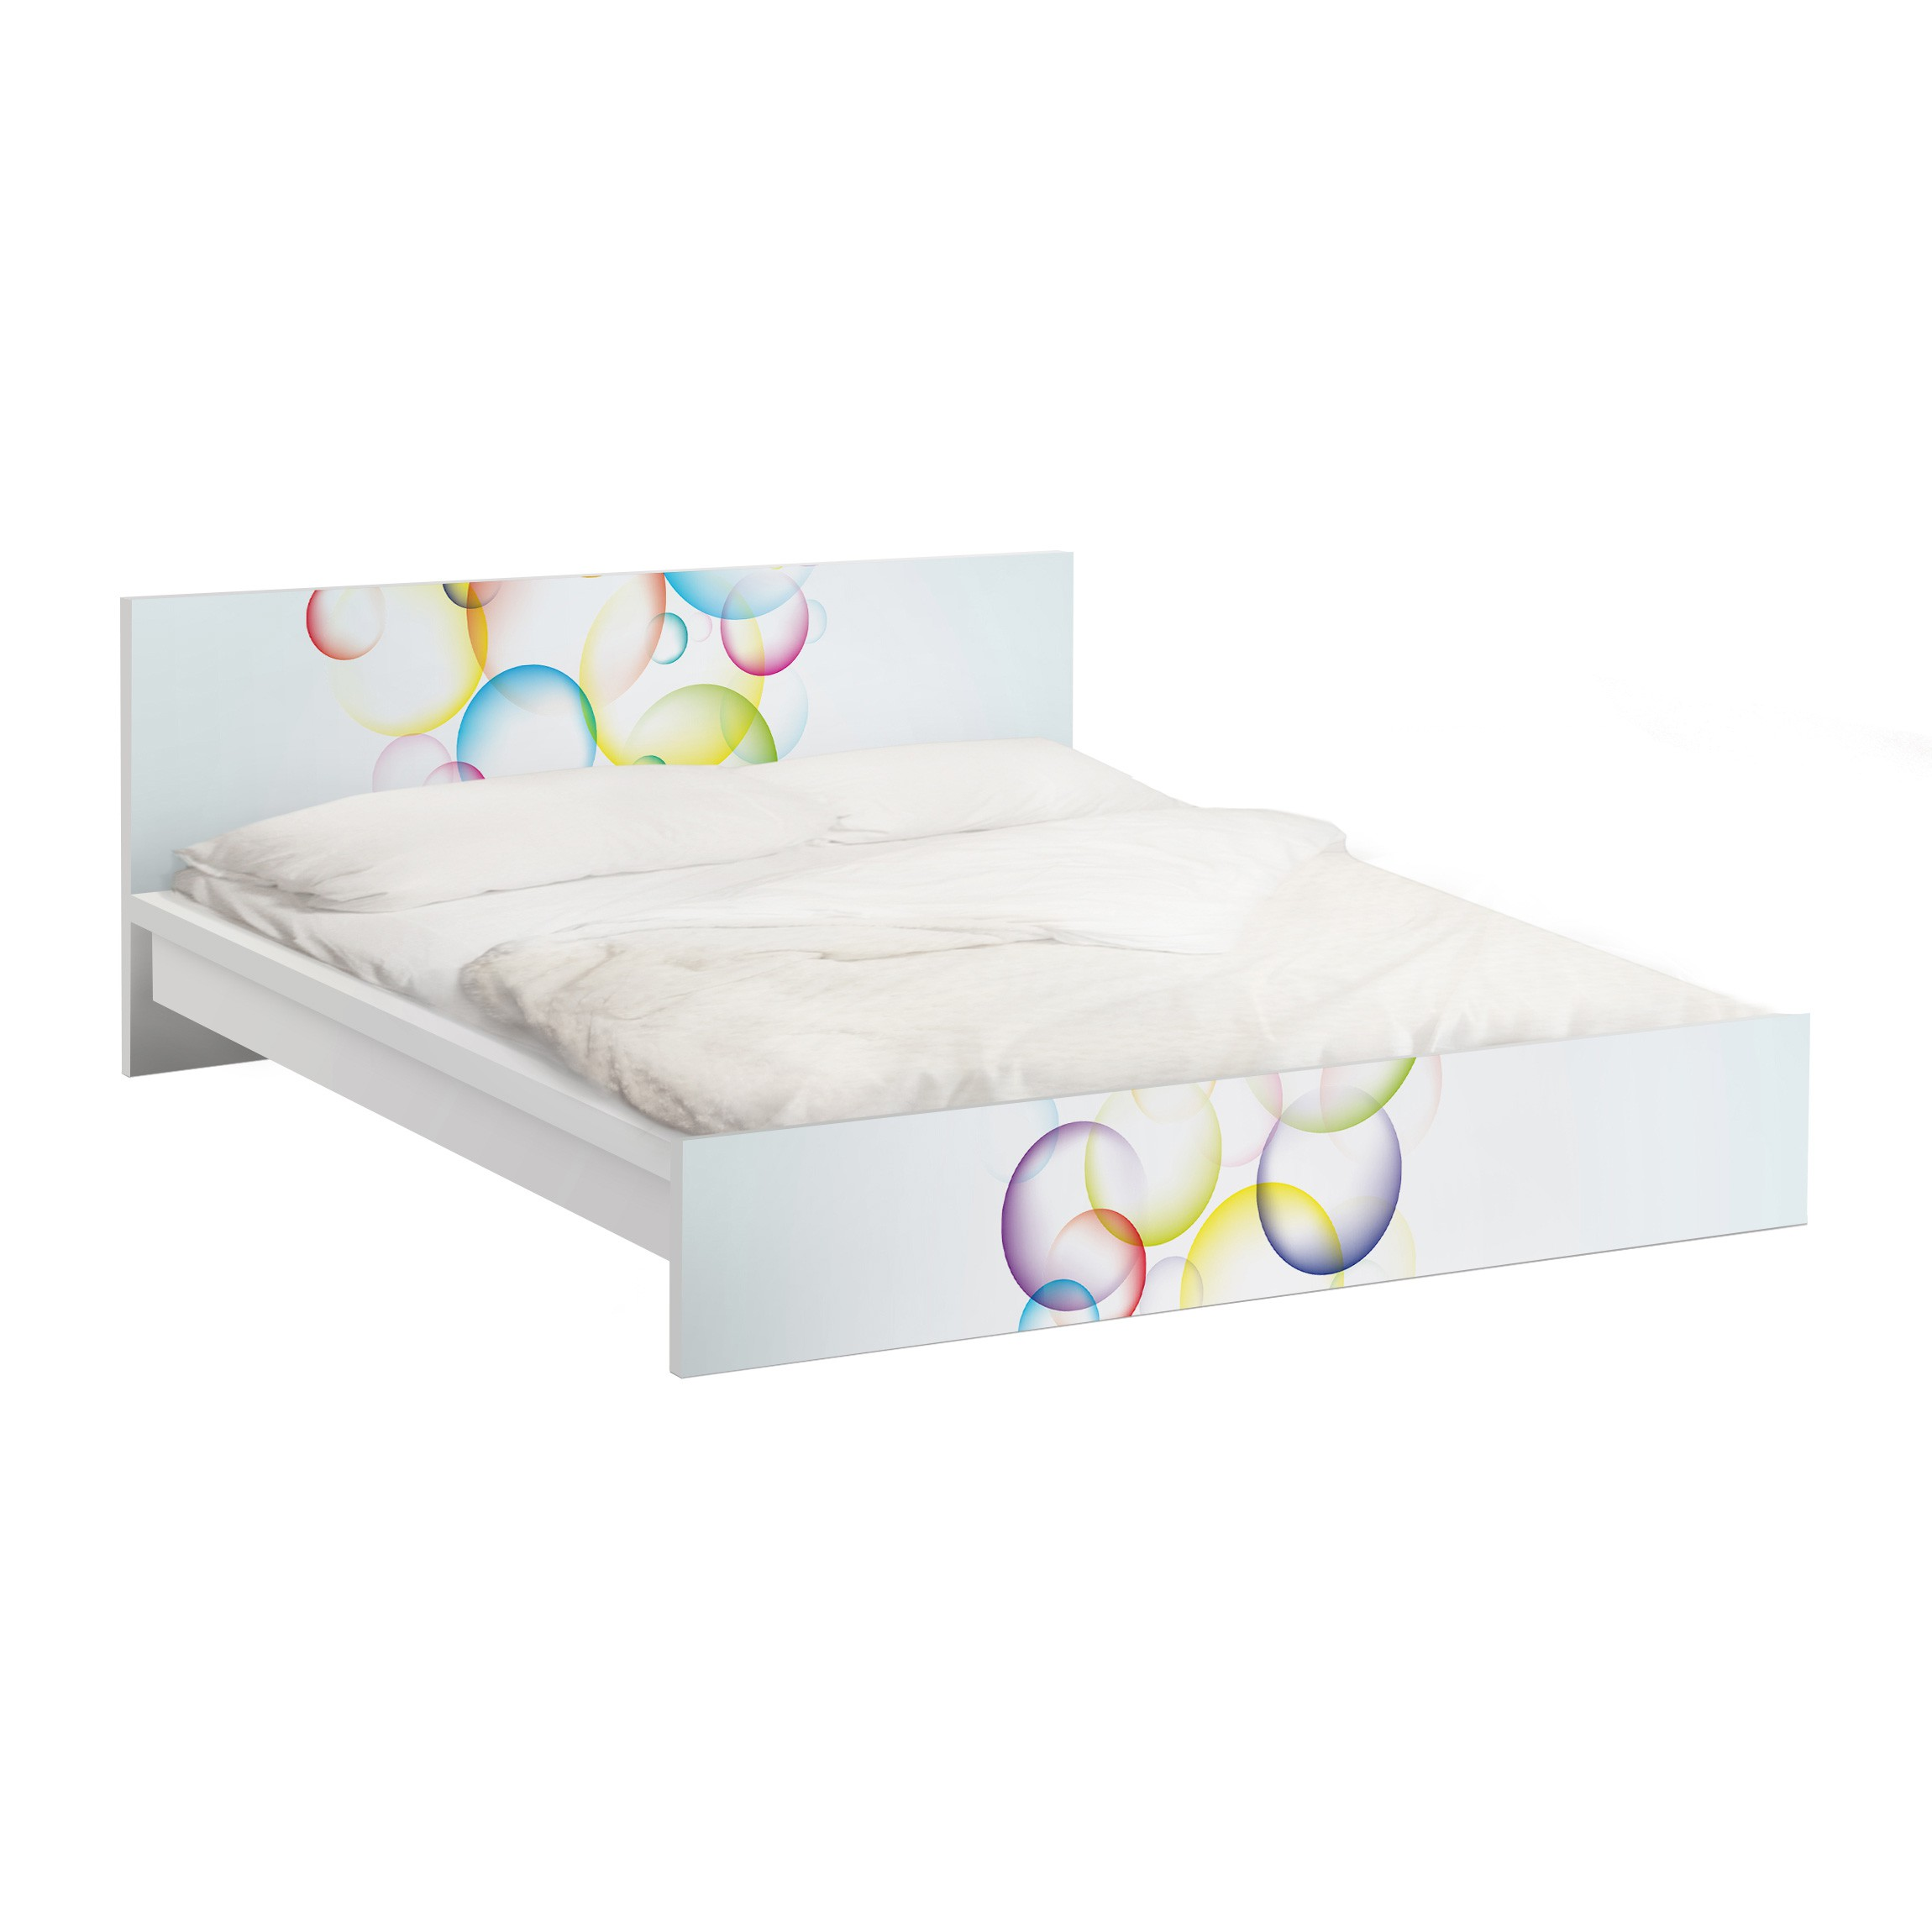 m belfolie f r ikea malm bett niedrig 180x200cm klebefolie rainbow bubbles. Black Bedroom Furniture Sets. Home Design Ideas